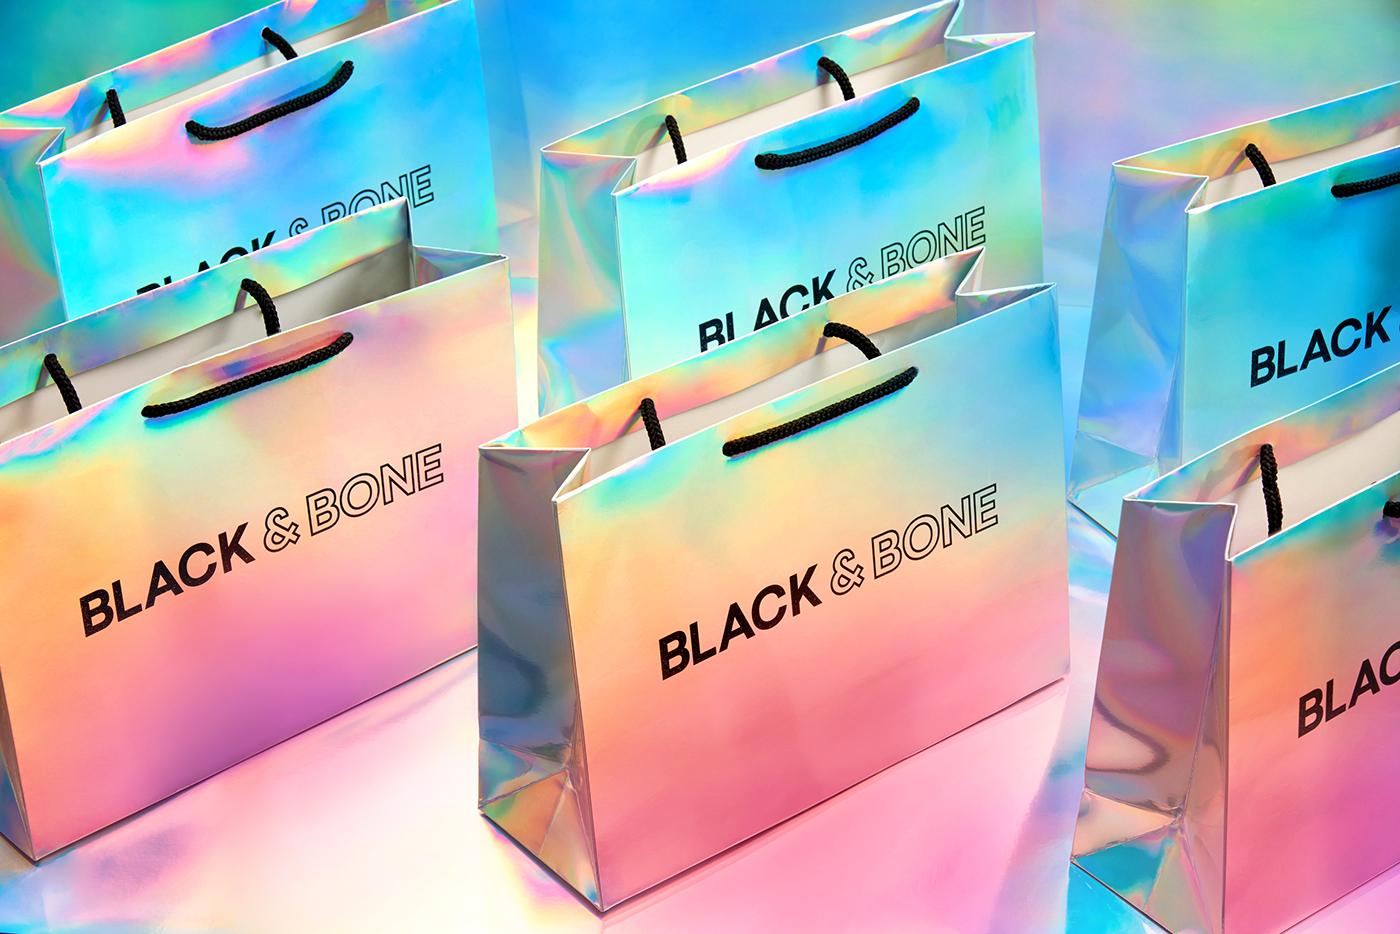 Black & Bone女装品牌设计 欣赏-第11张